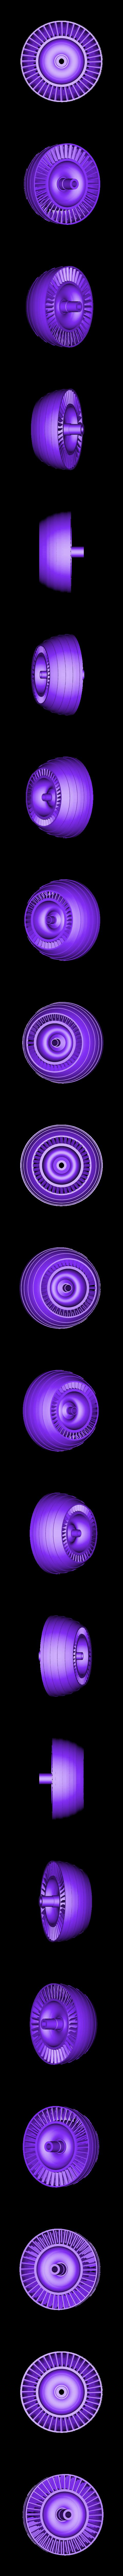 LPT-Rotor101ws.stl Download free STL file Jet Engine, 3-Spool • 3D printable object, konchan77